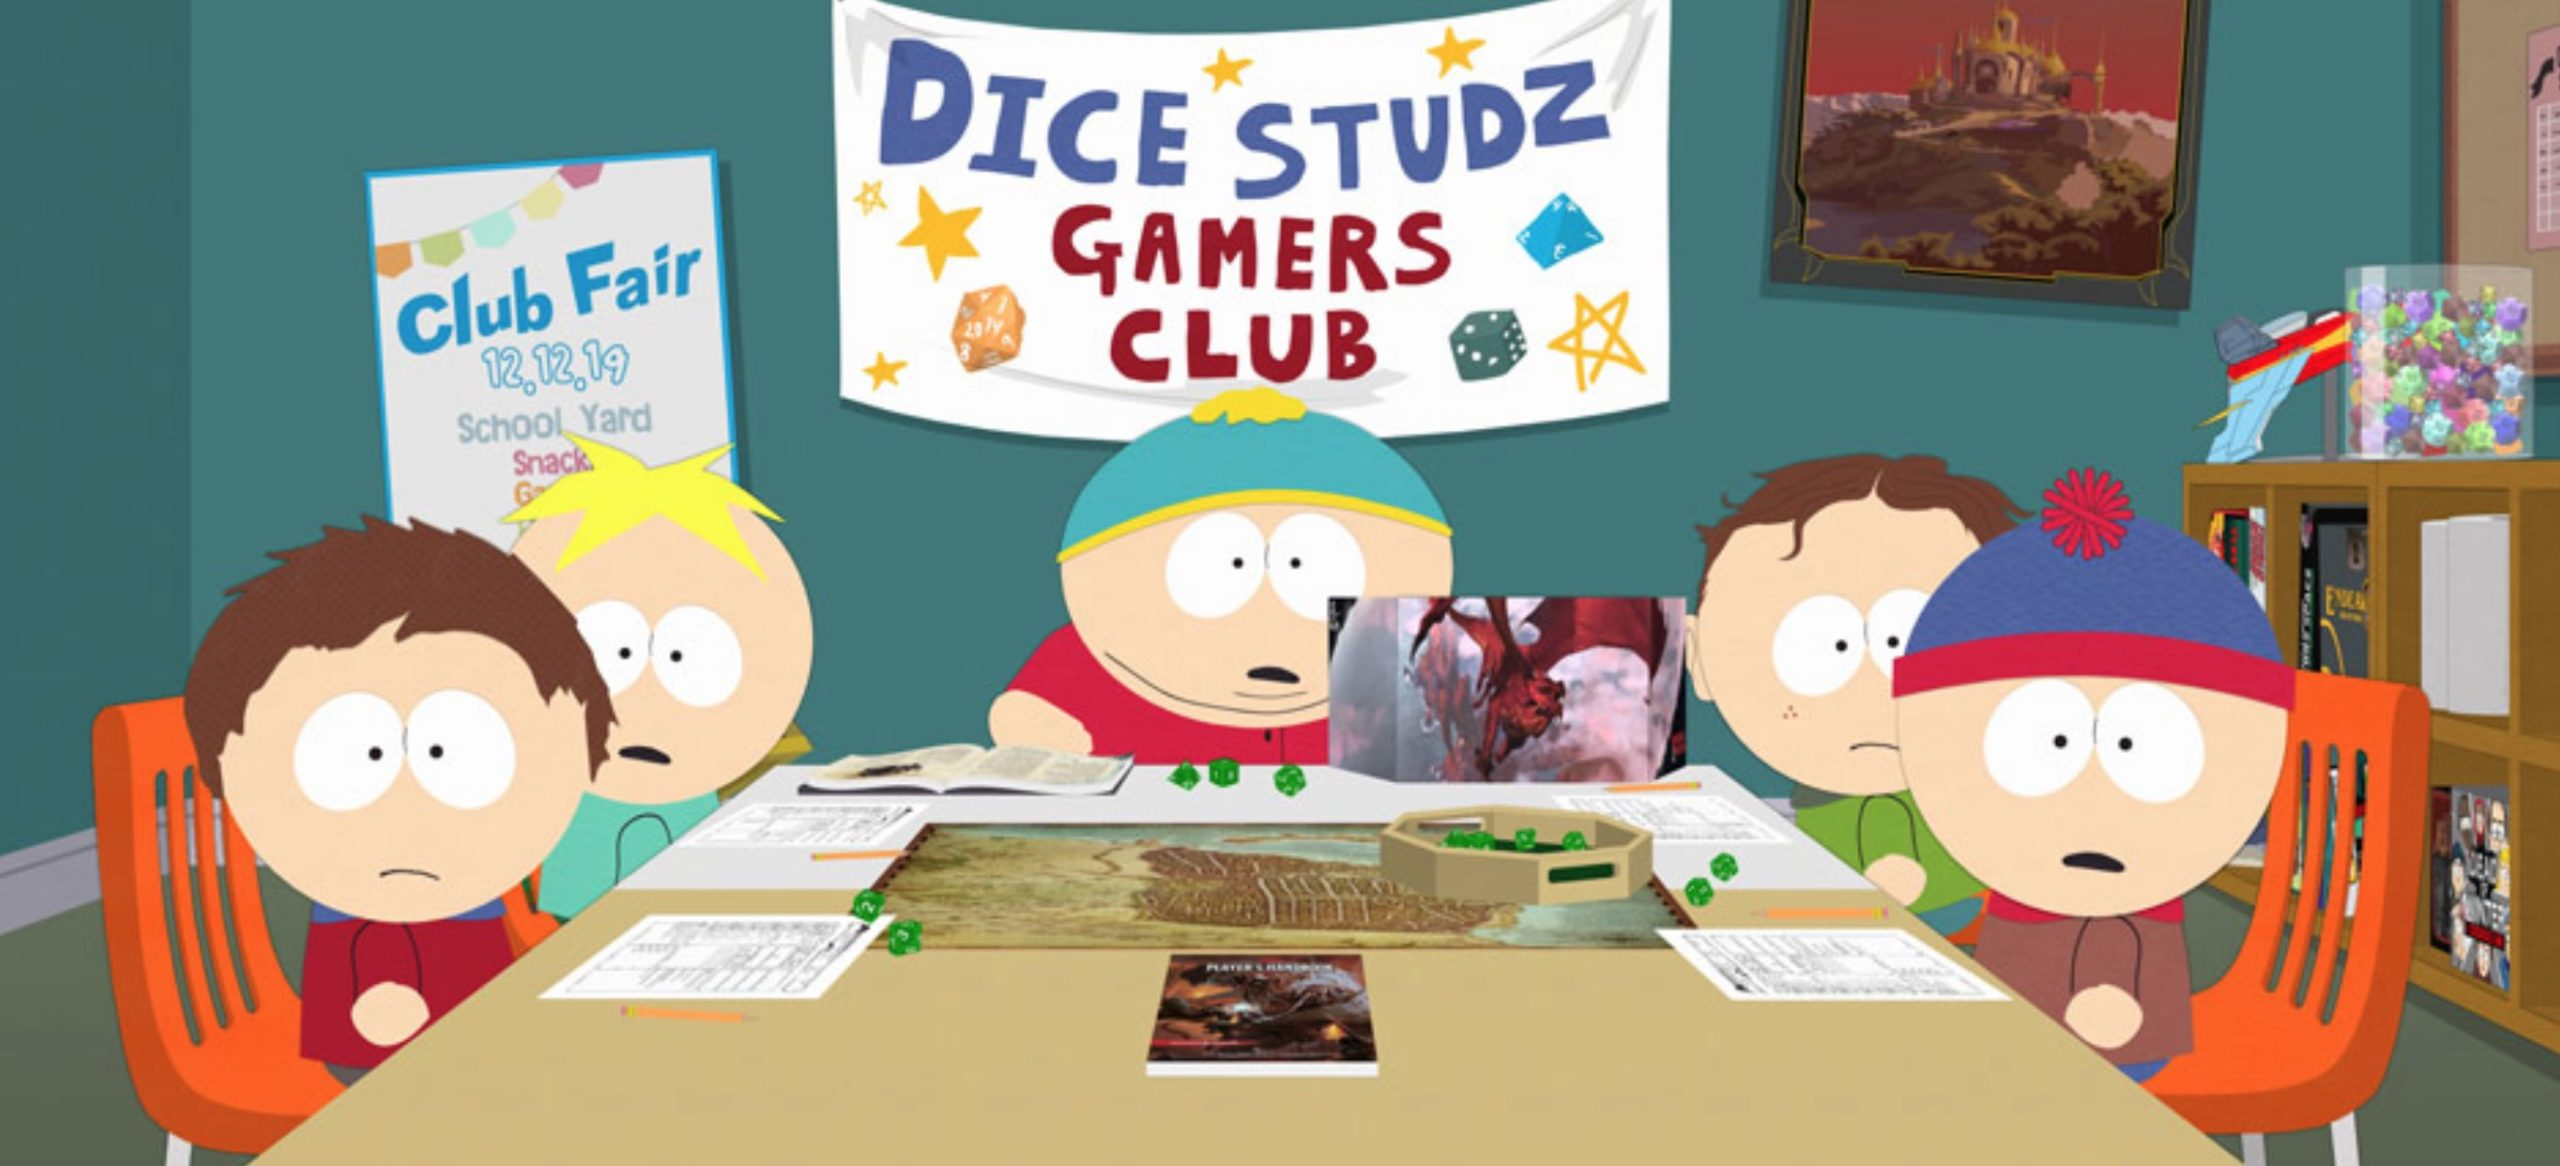 South Park Season 24 Is Already Confirmed Den Of Geek